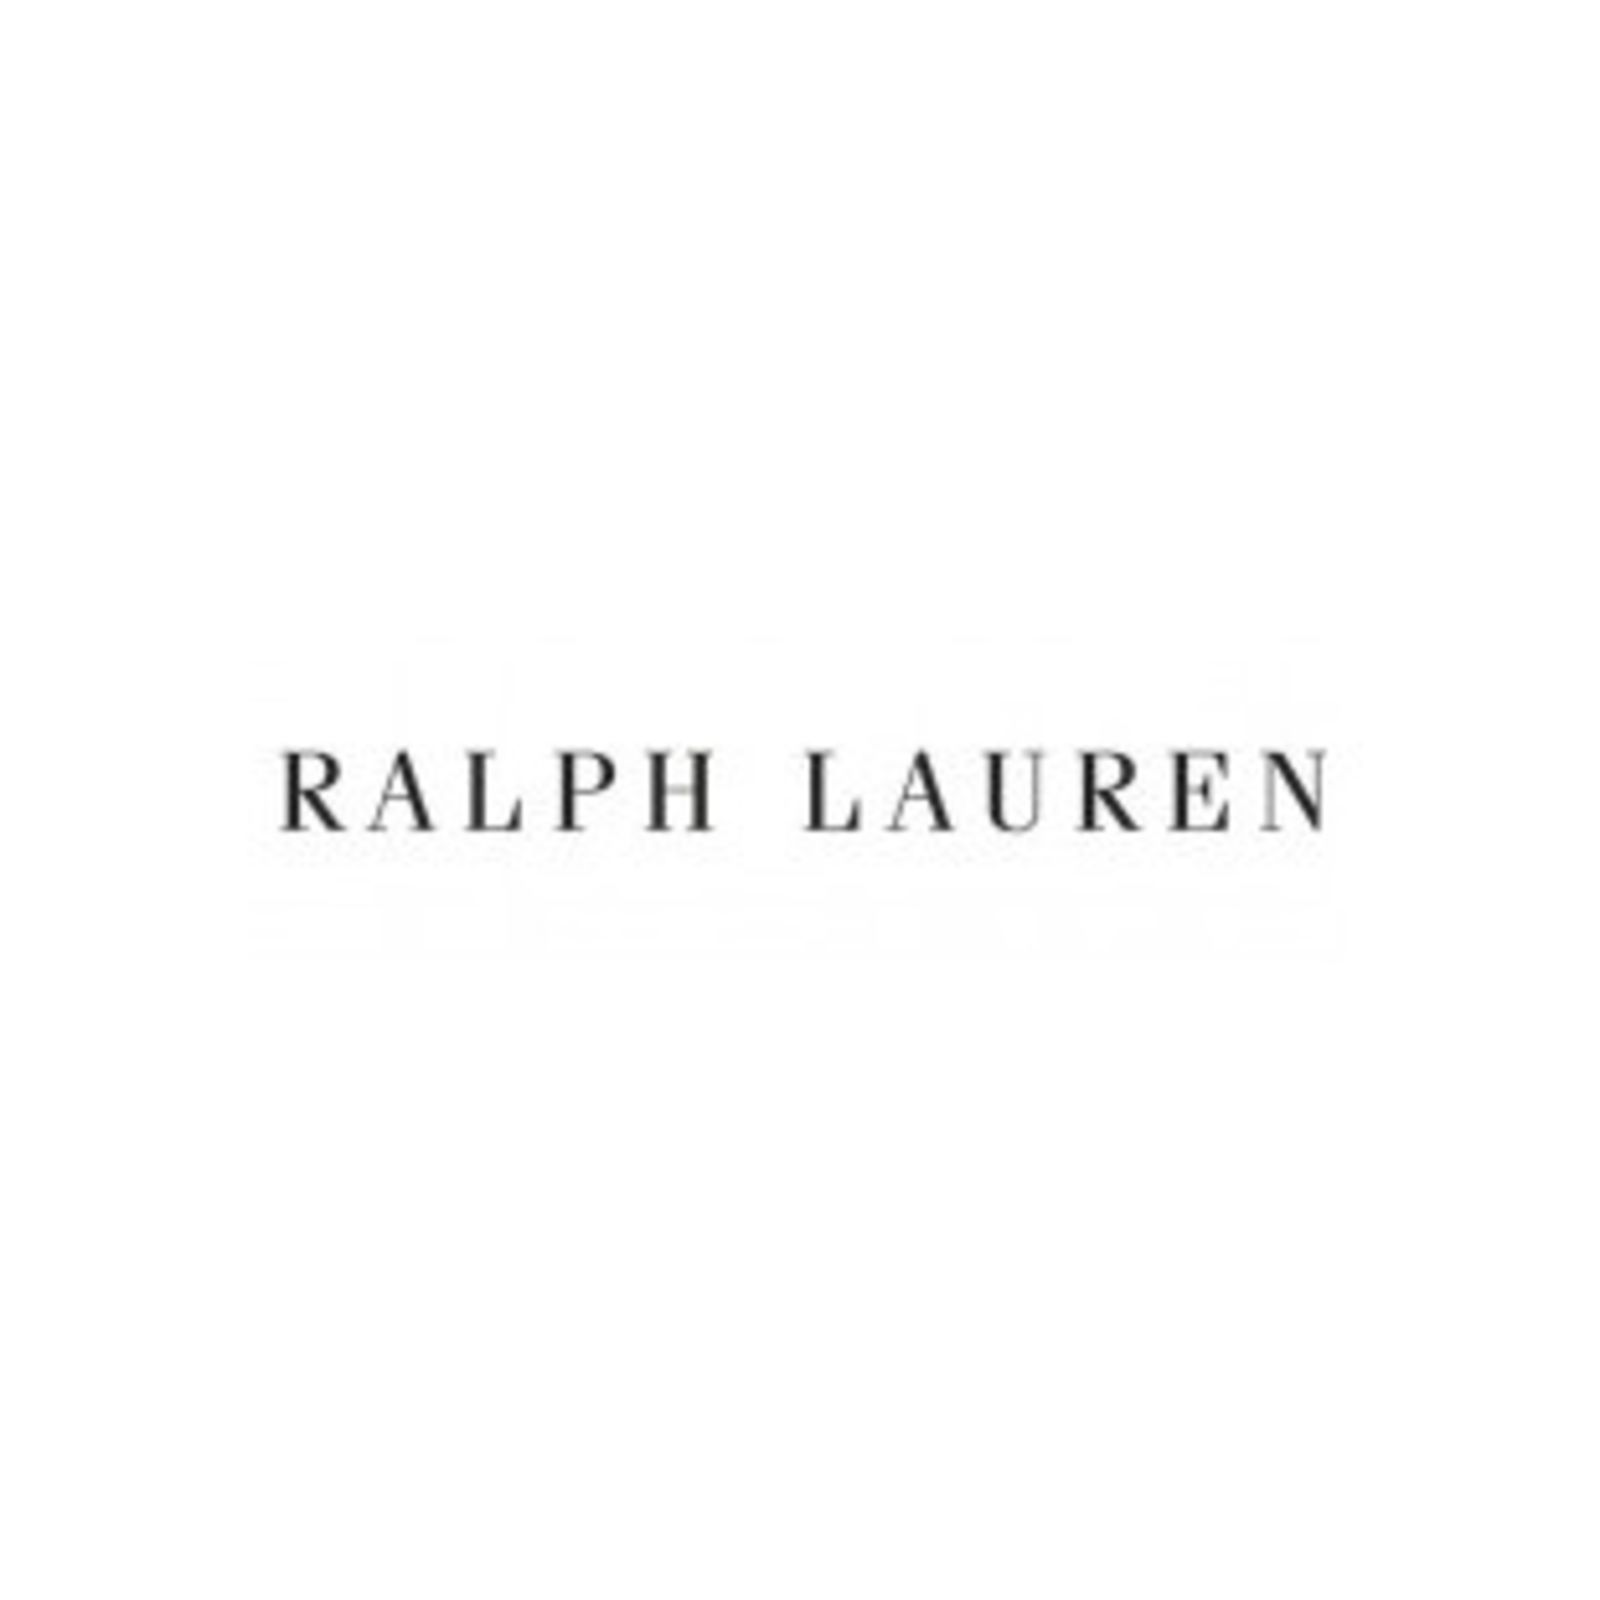 RALPH LAUREN EYEWEAR (Image 1)